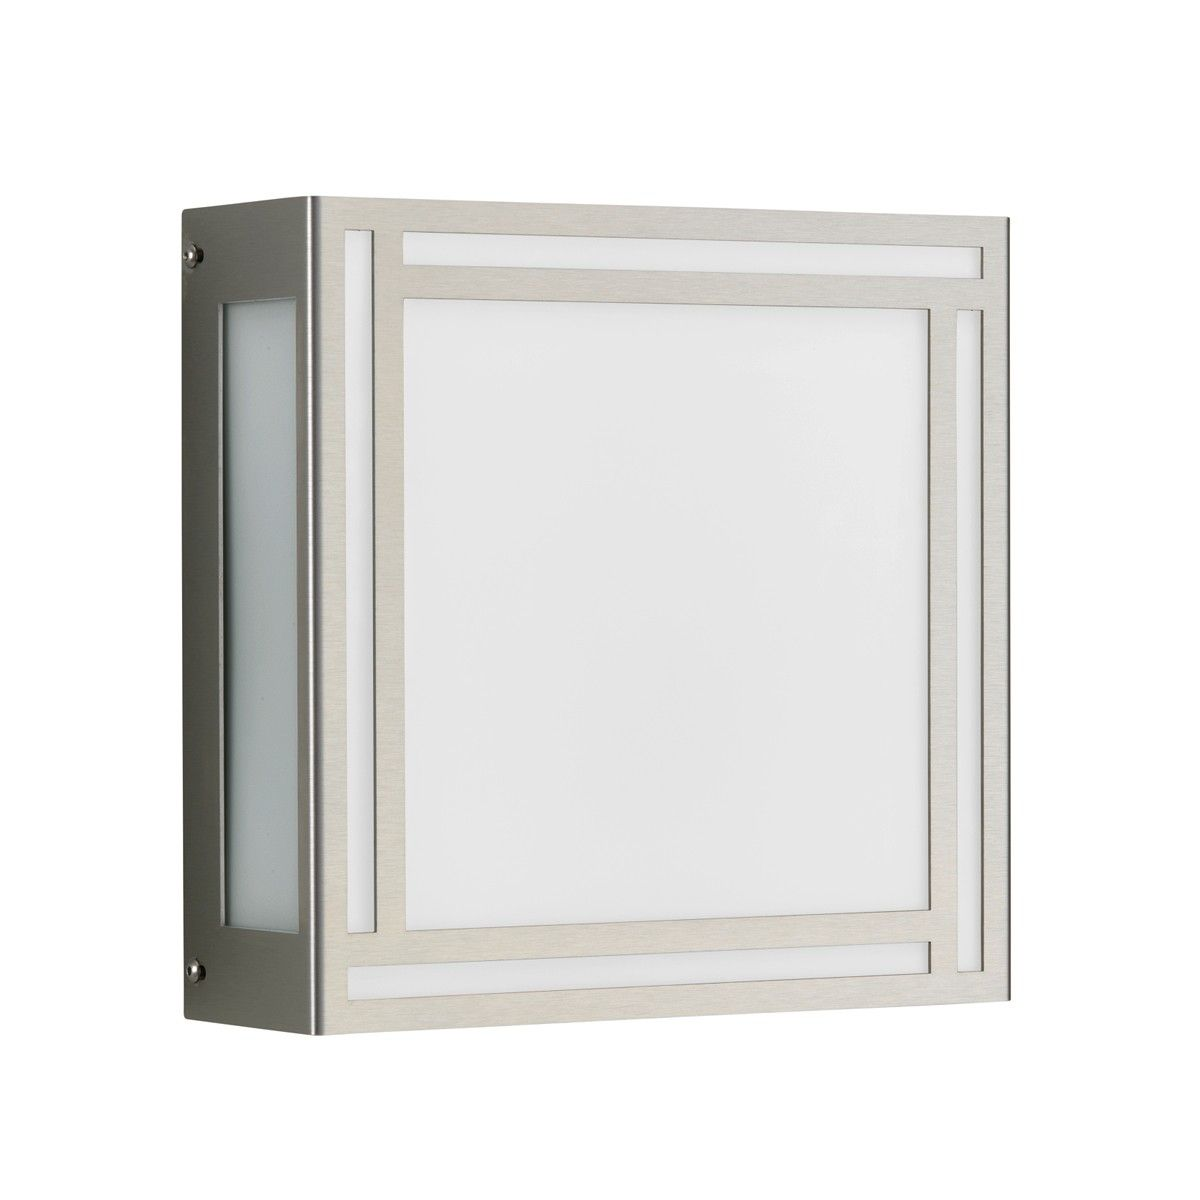 Deckenleuchte Led Flach Deckenleuchten Design Gold Badezimmer Beleuchtung Led Led Deckenleuchte K Led Deckenleuchte Kuche Deckenleuchten Wohnraumleuchten